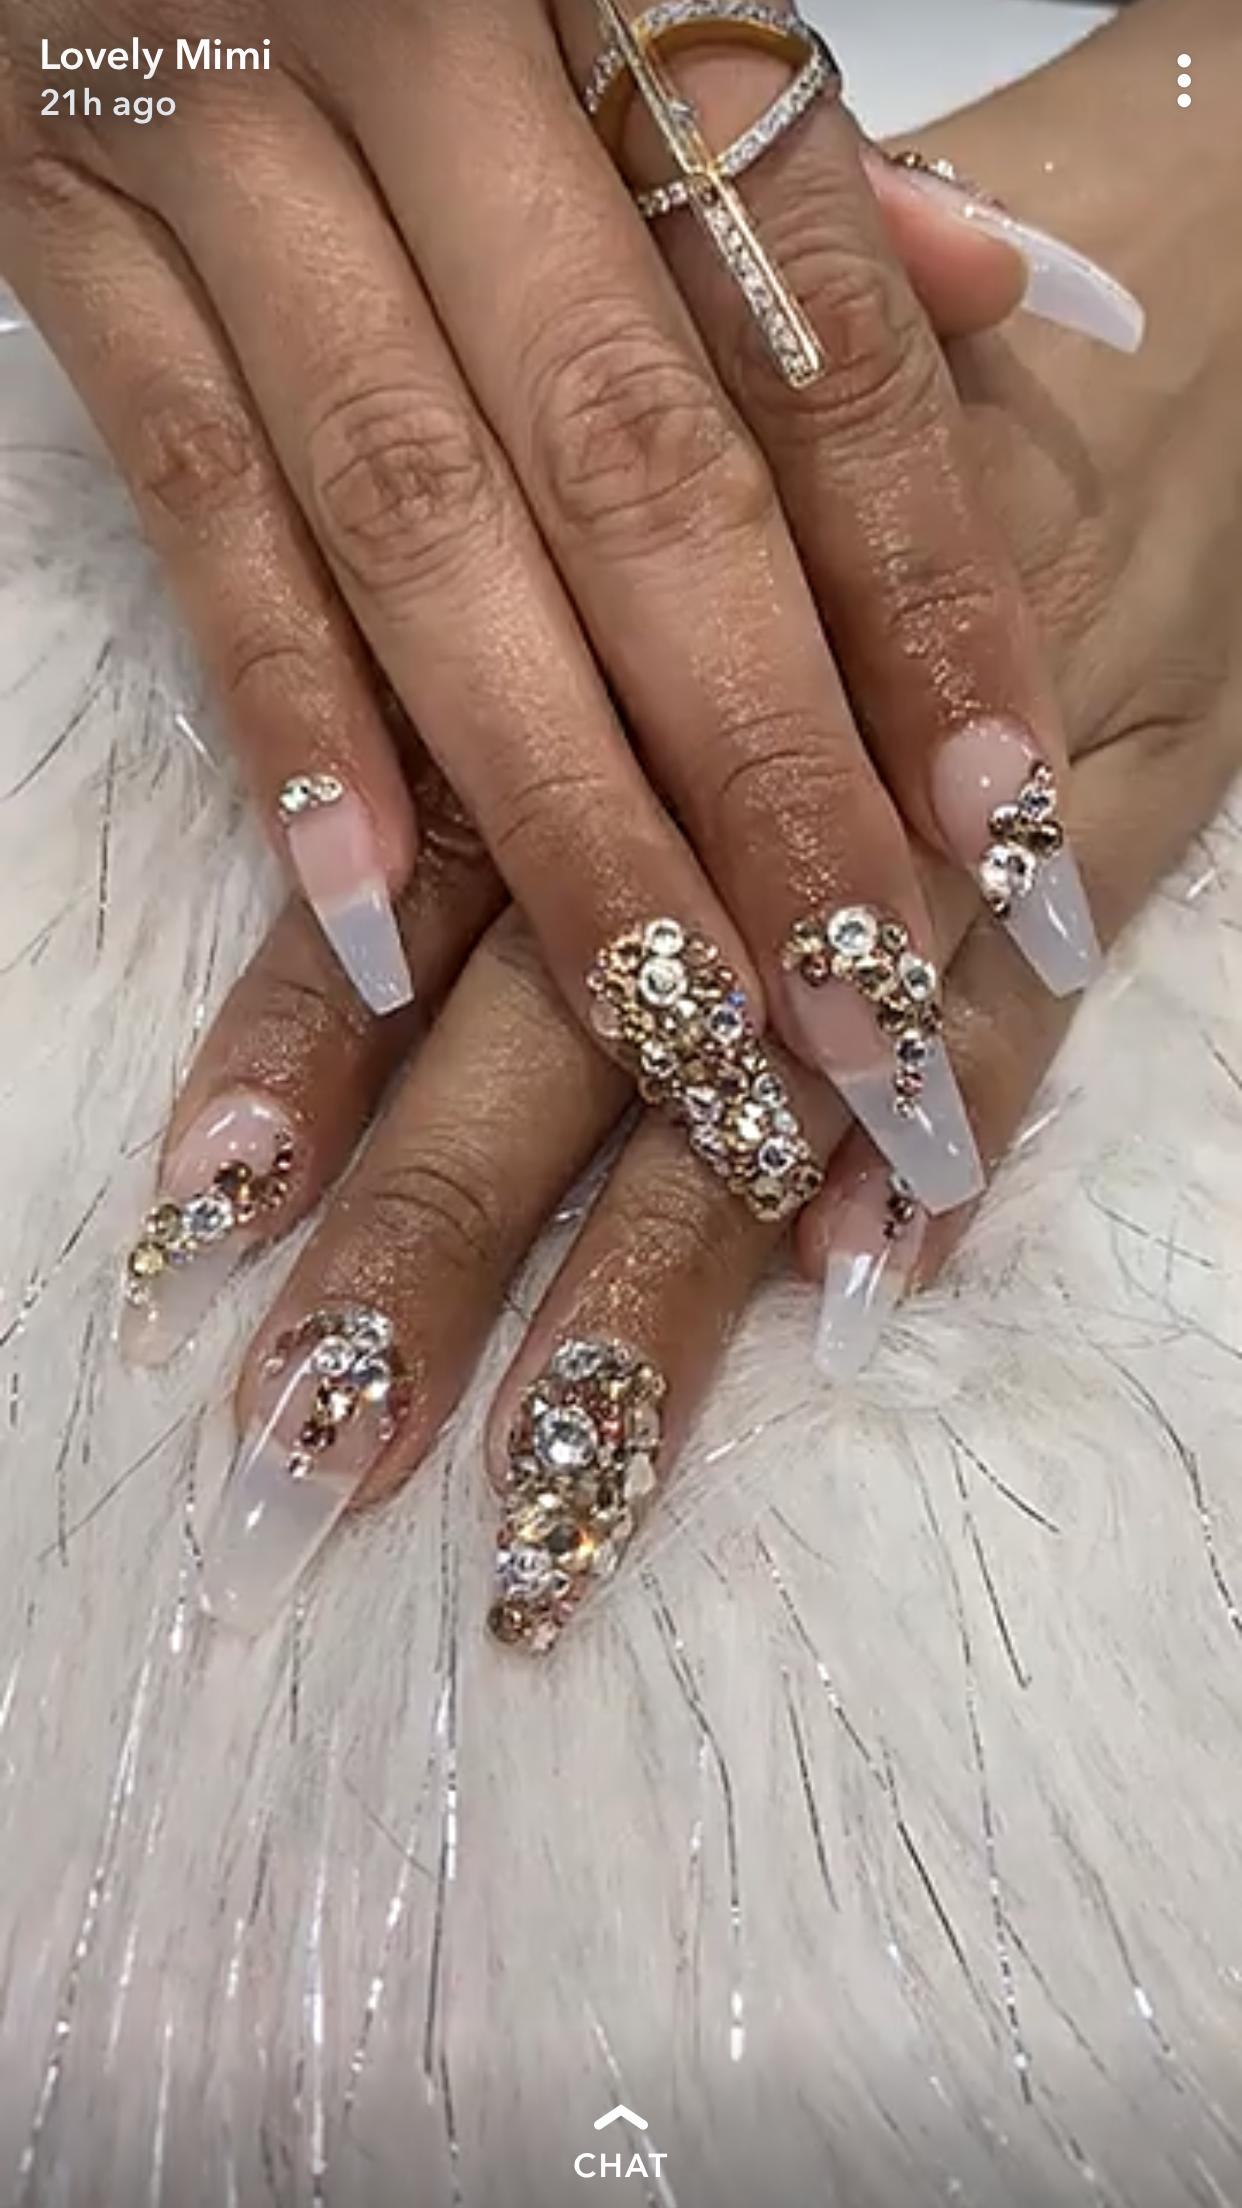 Lovely Mimi Nails : lovely, nails, Lovely, Nagels